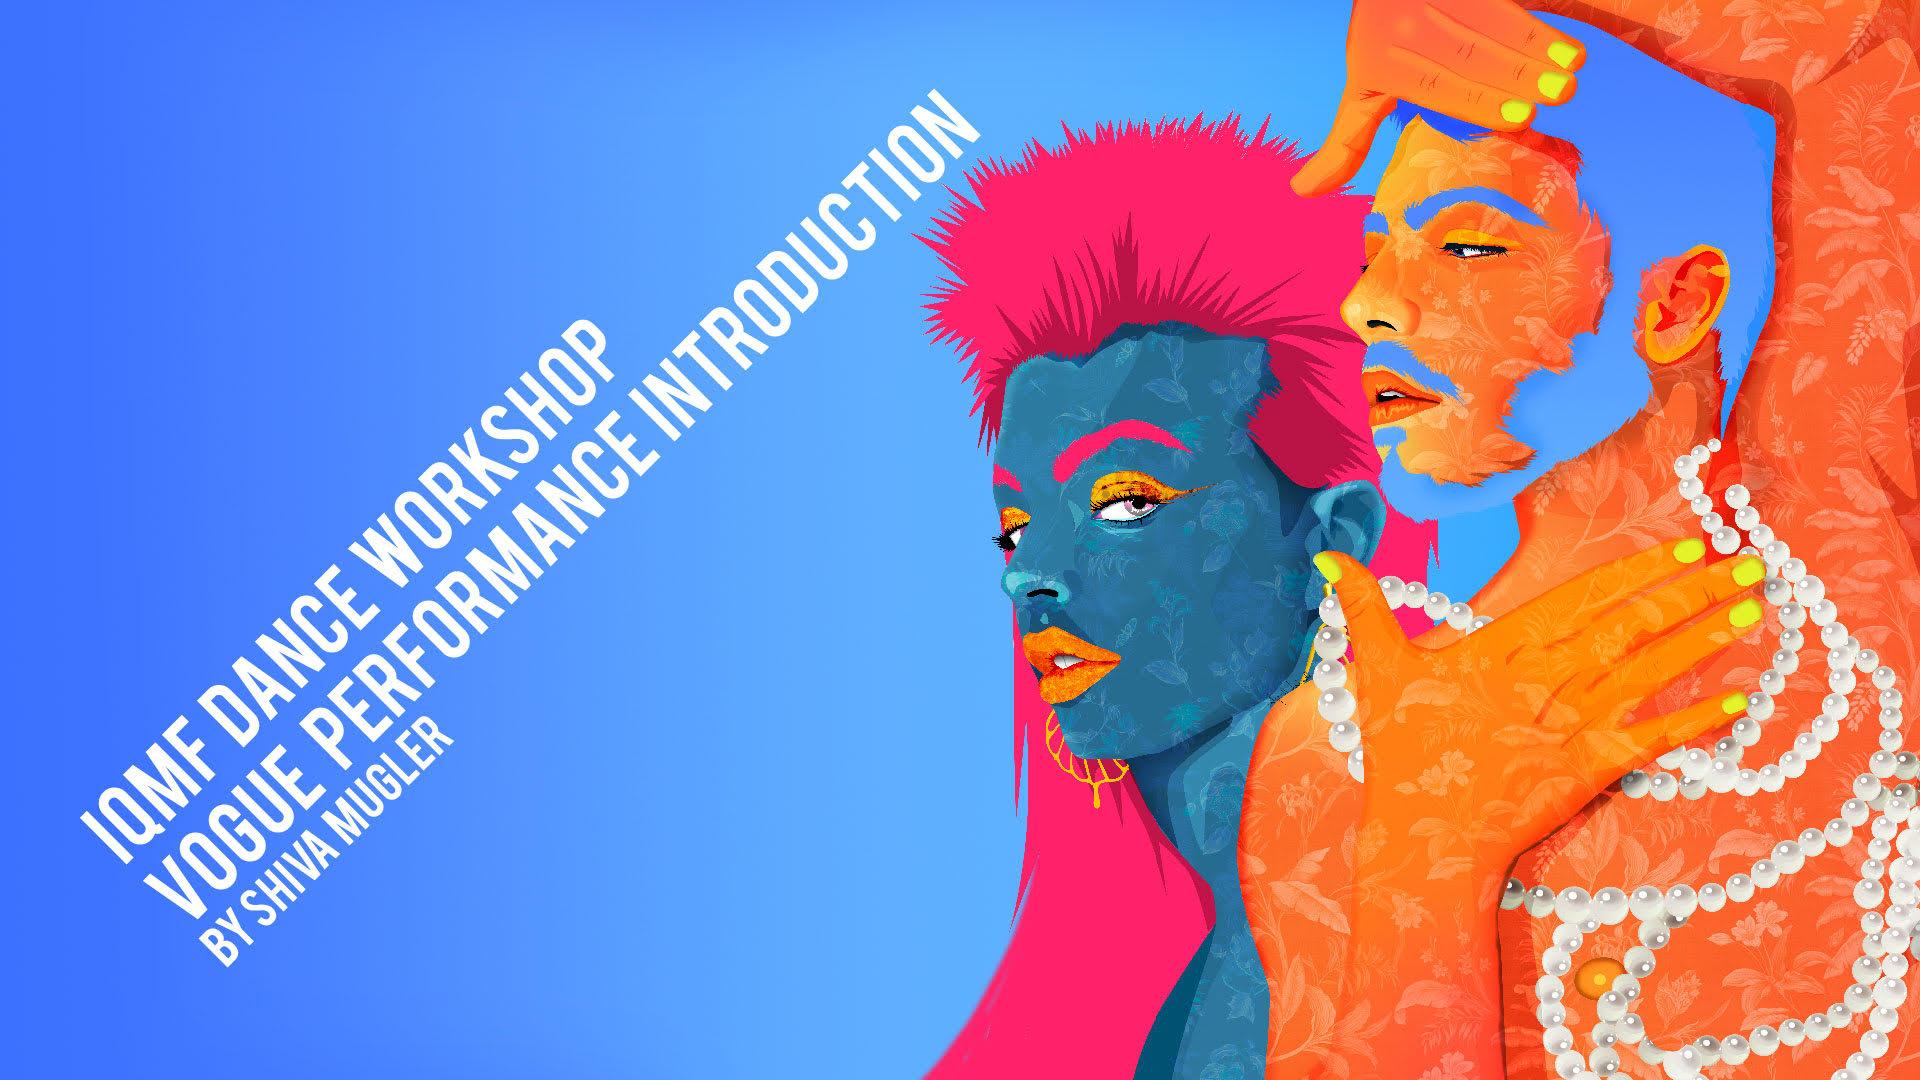 Poster IQMF Workshops: Vogue Performance Introduction with Shiva Mugler